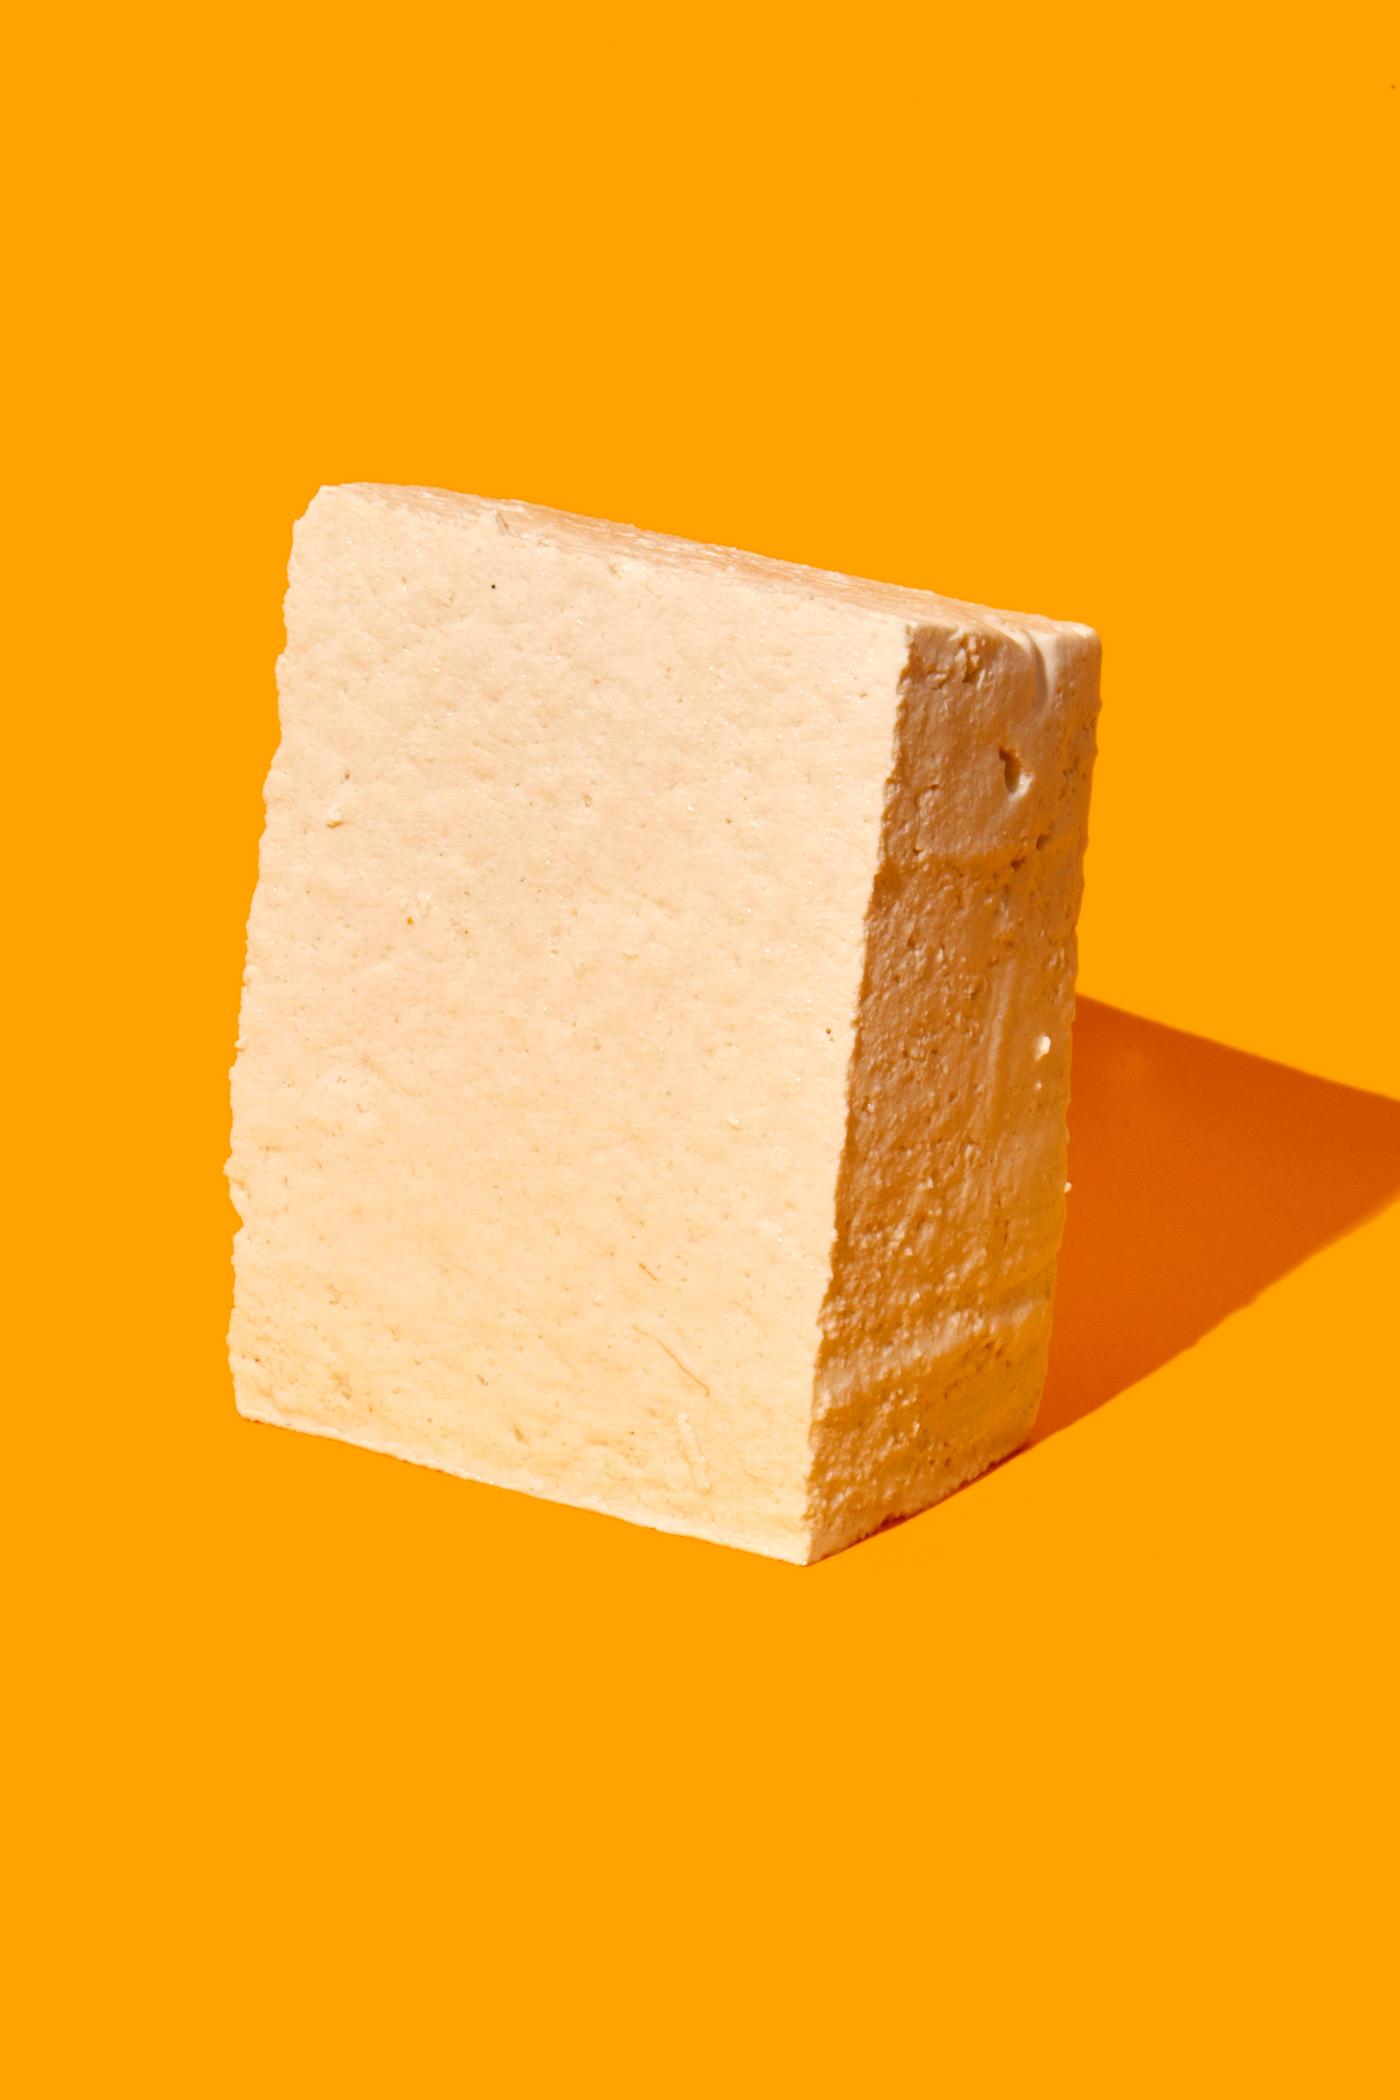 healthiest foods, health food, diet, nutrition, time.com stock, tofu